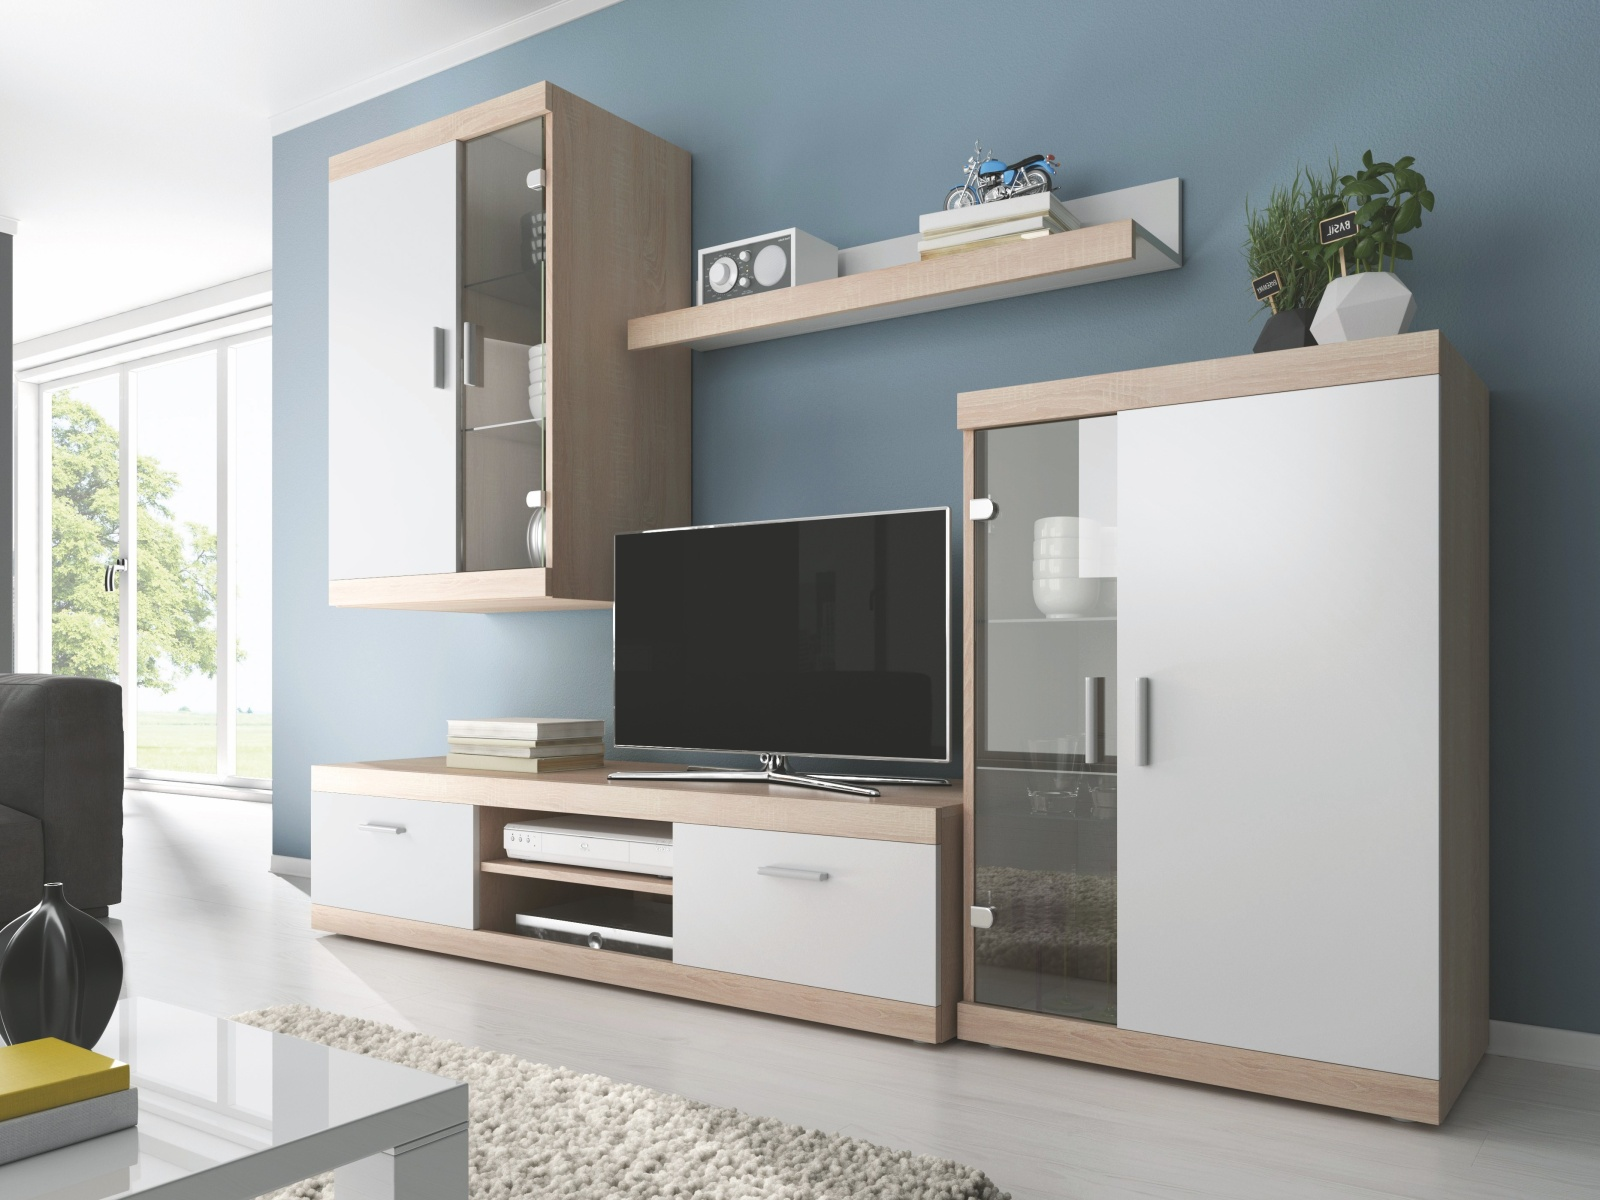 Smartshop DUO obývací stěna, dub sonoma/bílá